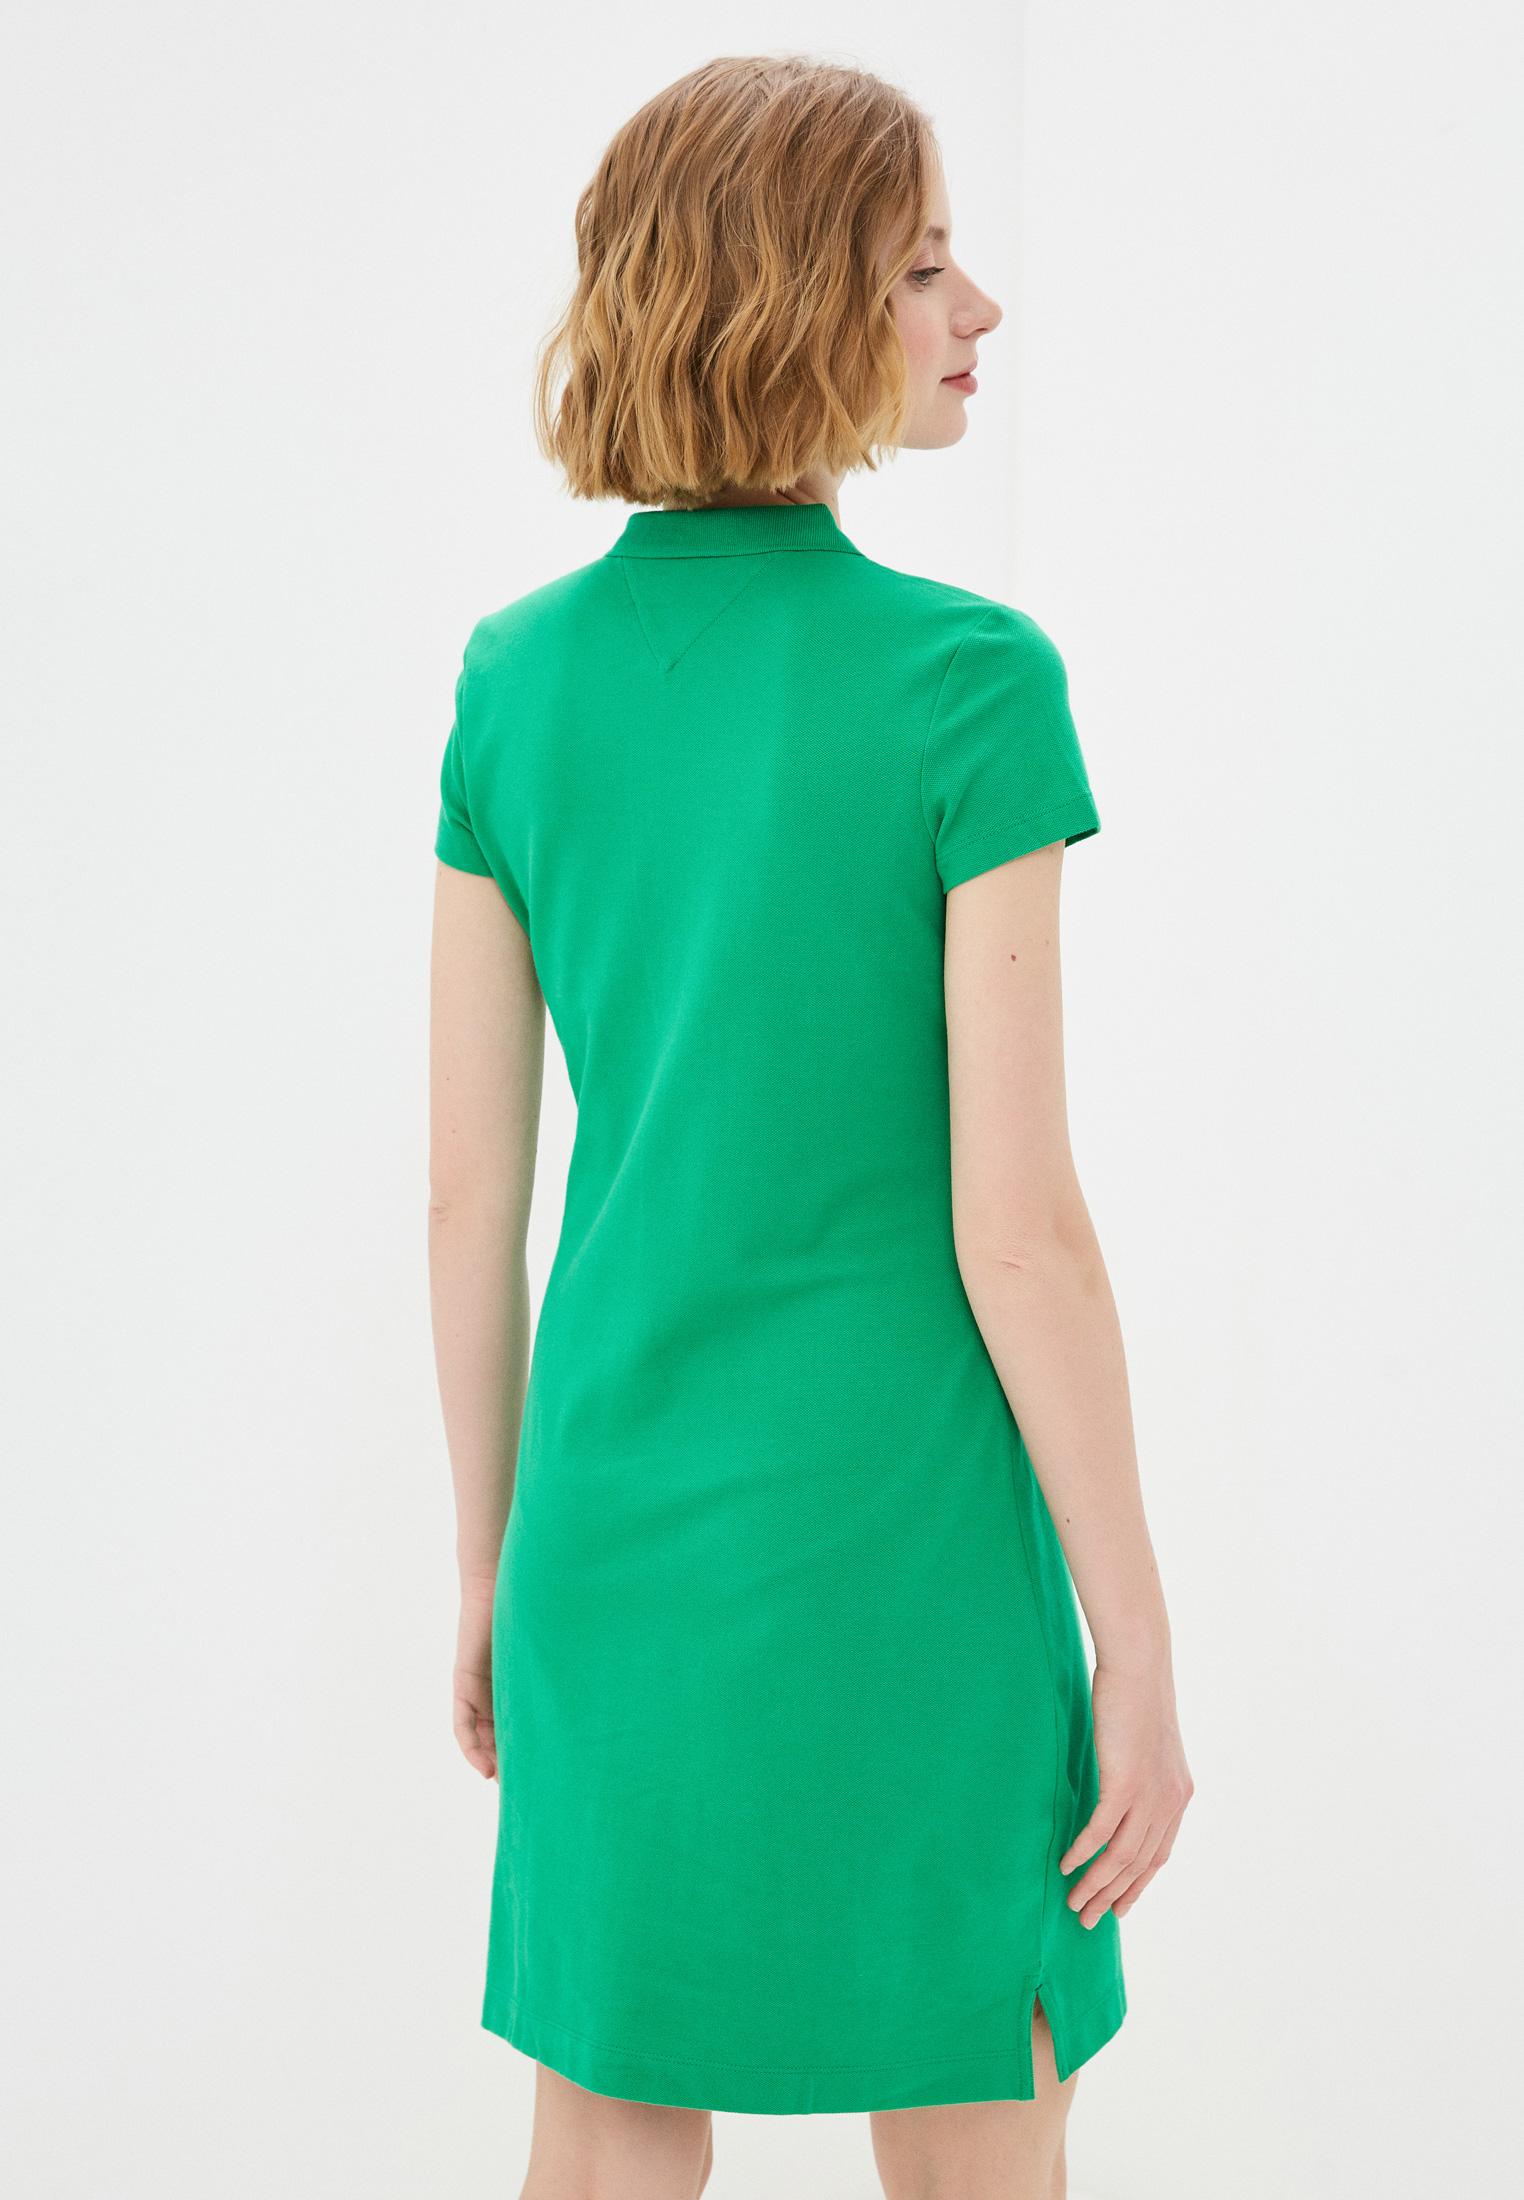 Платье Tommy Hilfiger (Томми Хилфигер) WW0WW27949: изображение 3